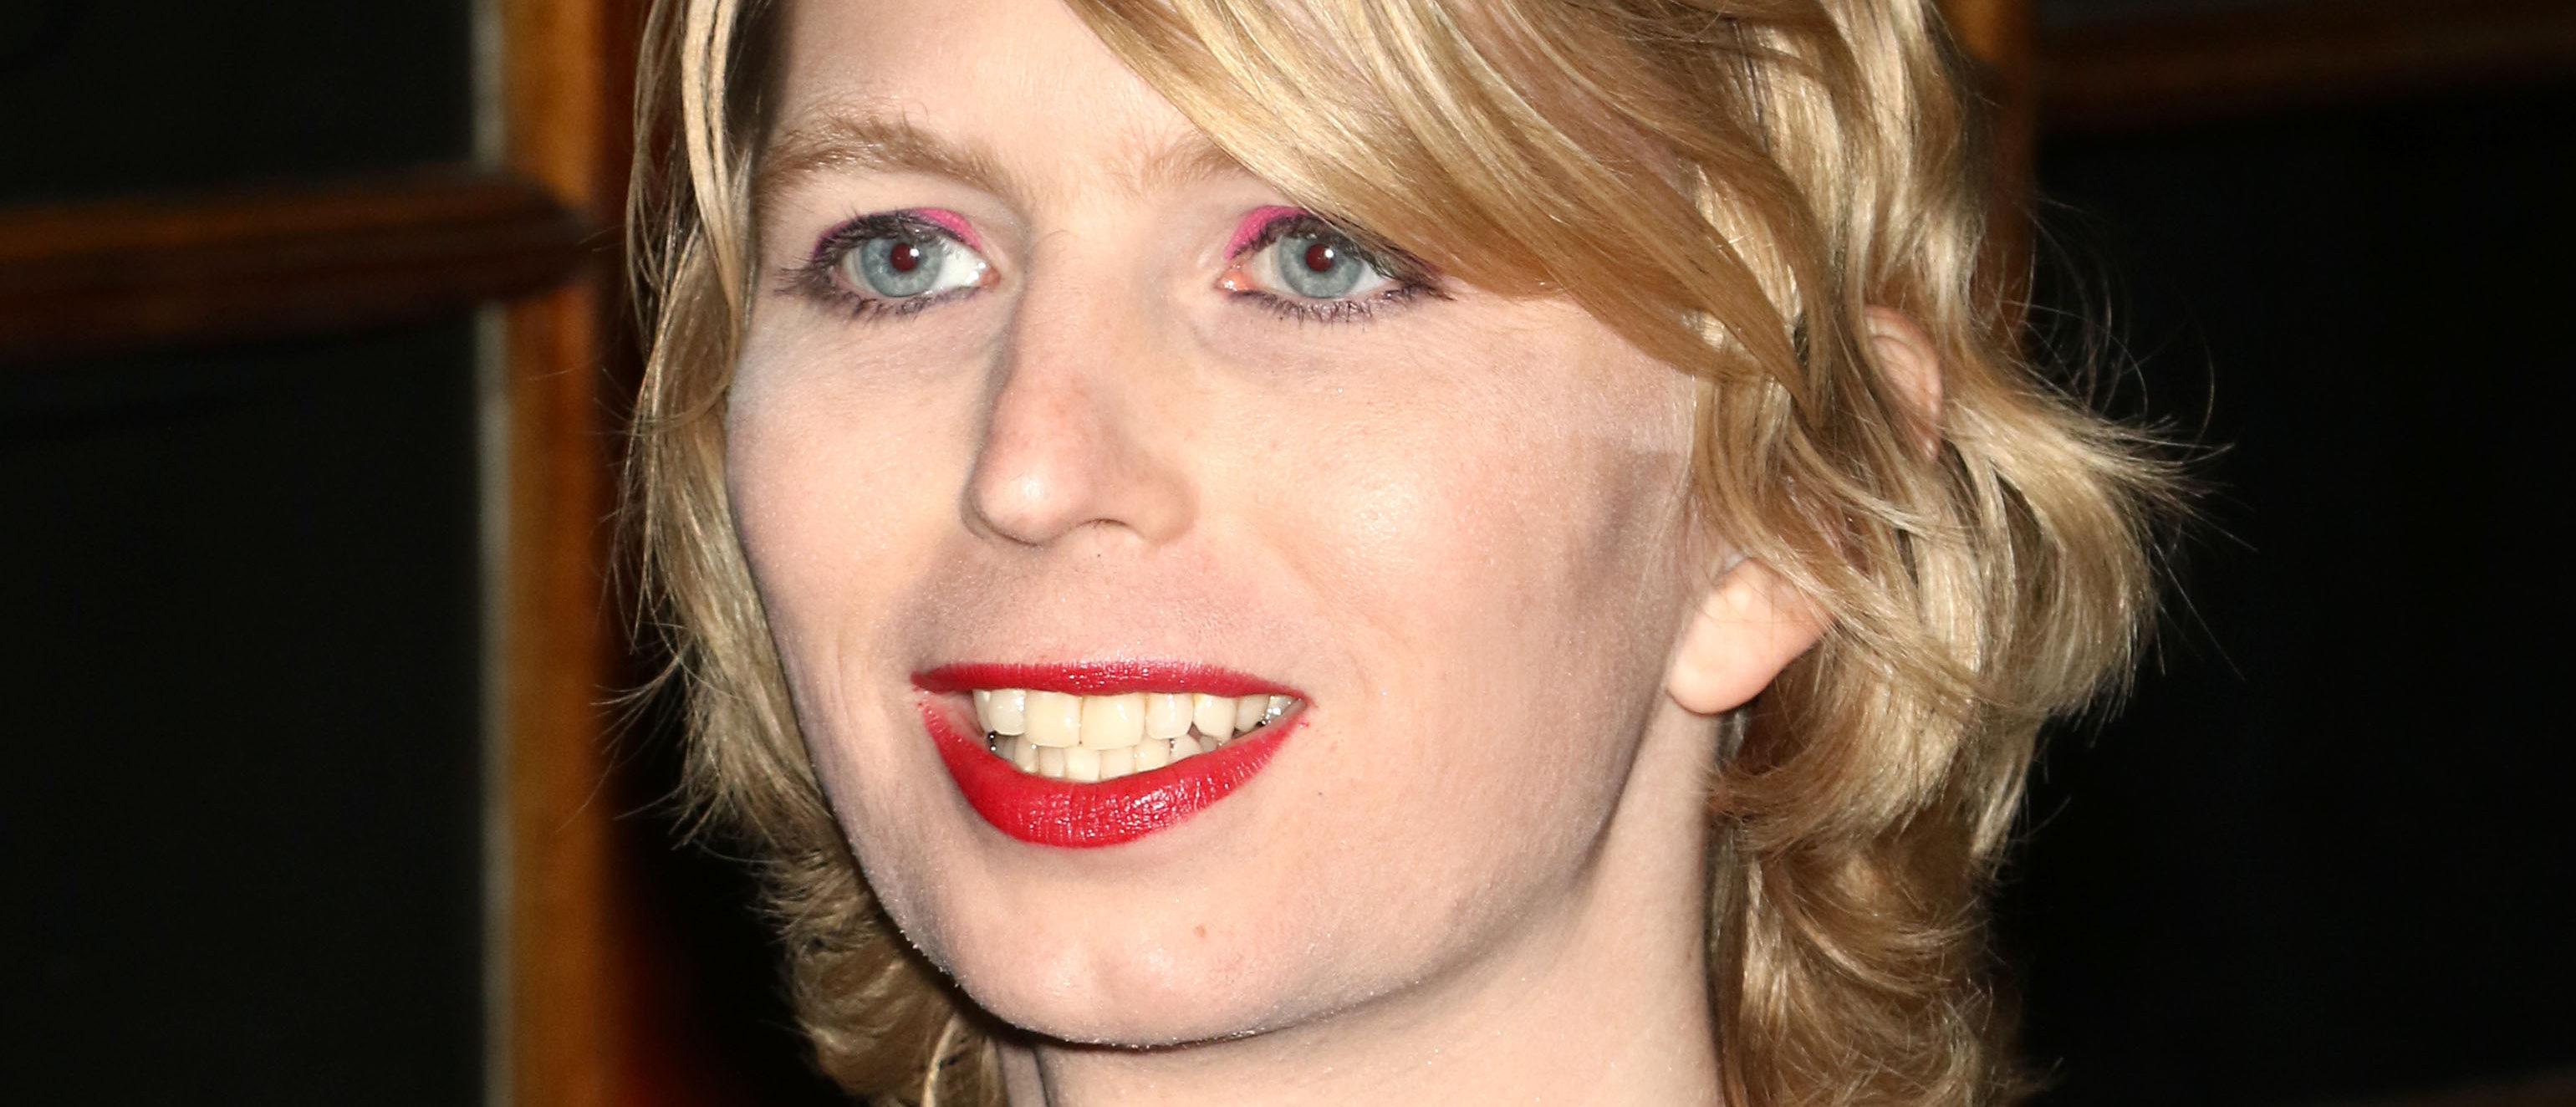 UCLA Hosts Chelsea Manning | Chelsea Manning (Shutterstock/Jstone)